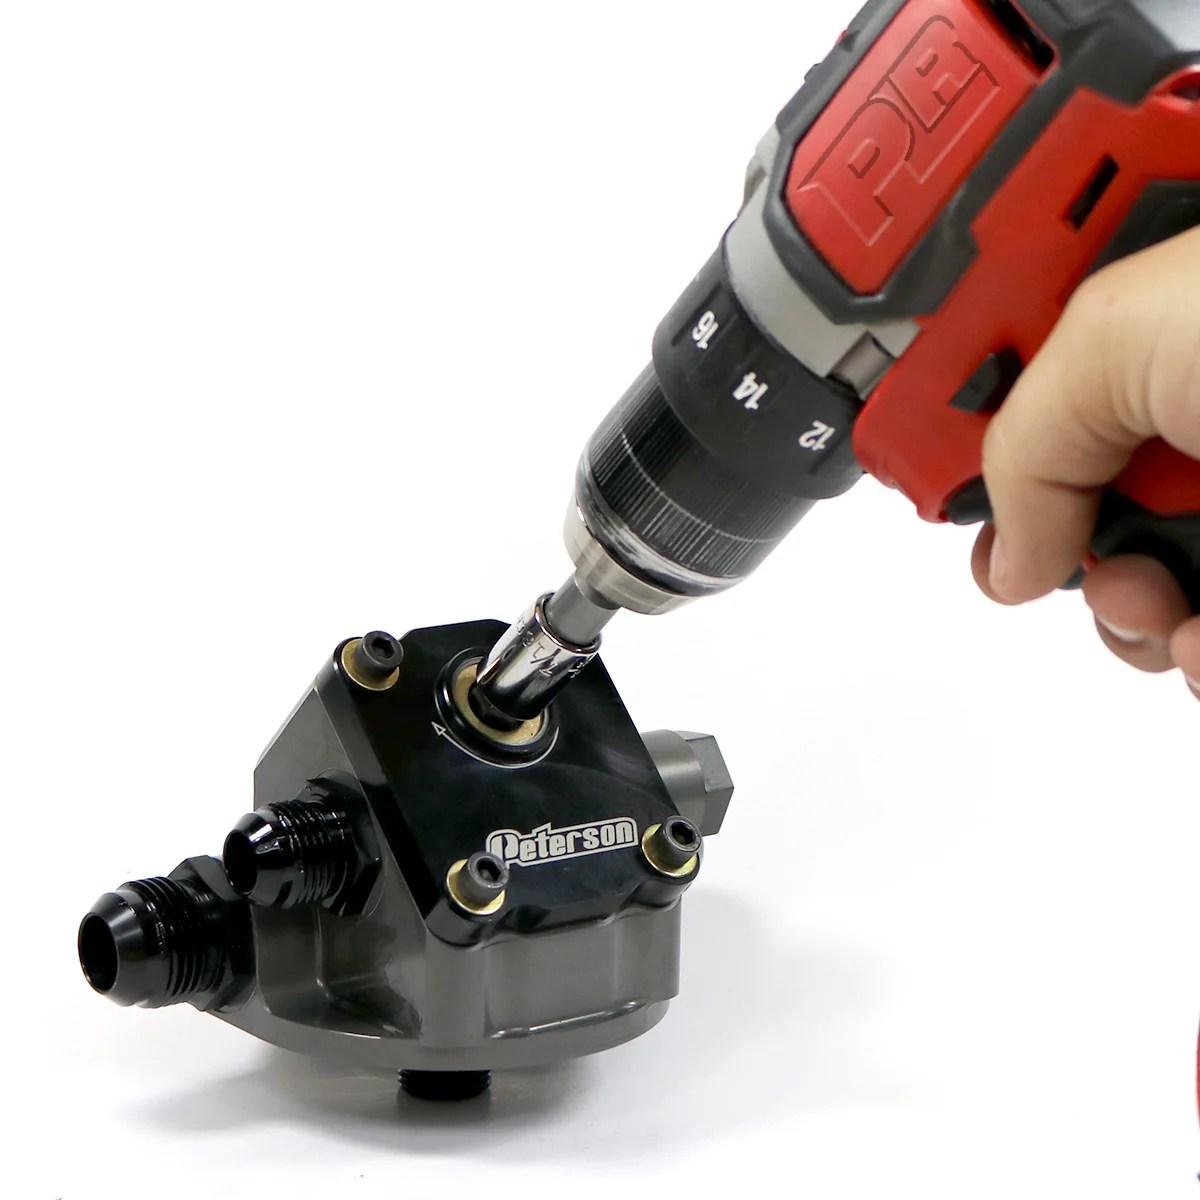 peterson primer remote filter mount drill  [ 1200 x 1200 Pixel ]